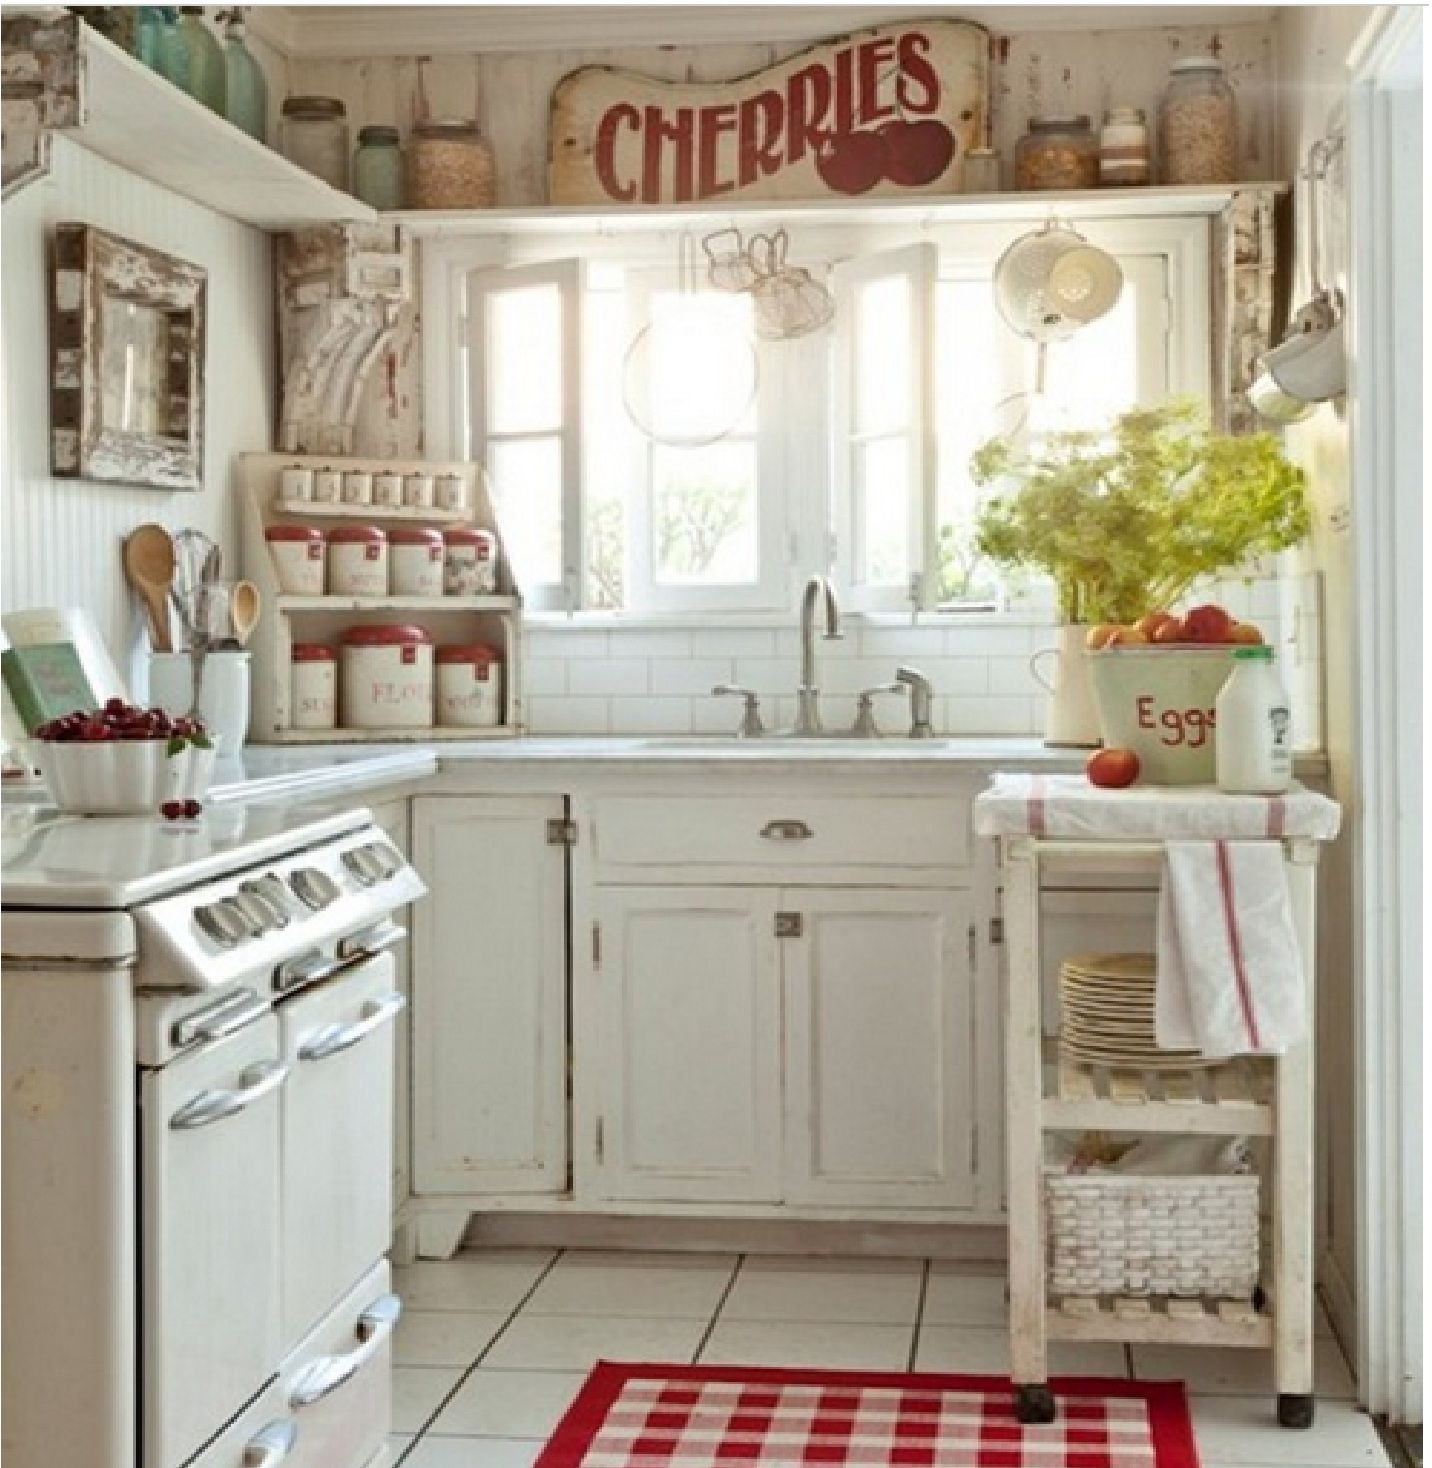 cocina eclectico | Cocinas Rústicas | Pinterest | Cocina ecléctica ...